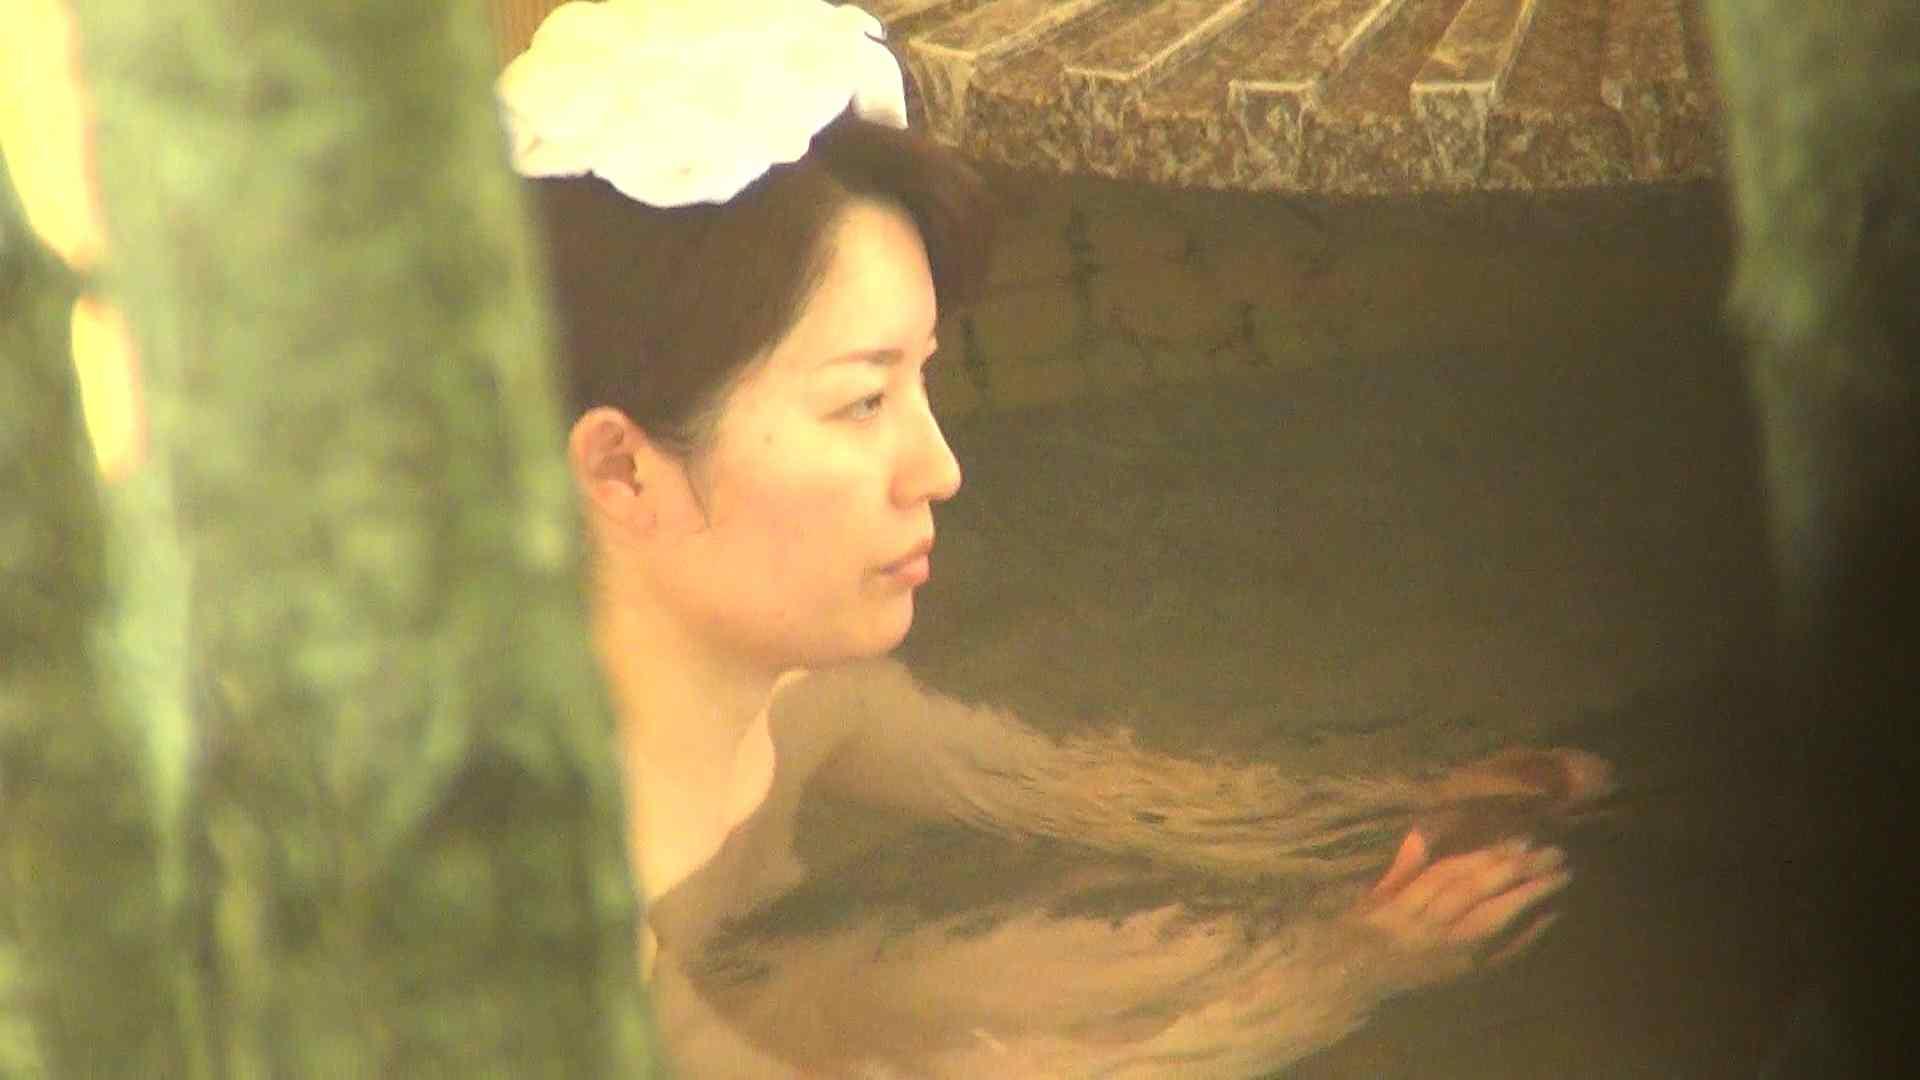 Aquaな露天風呂Vol.301 0  11連発 10